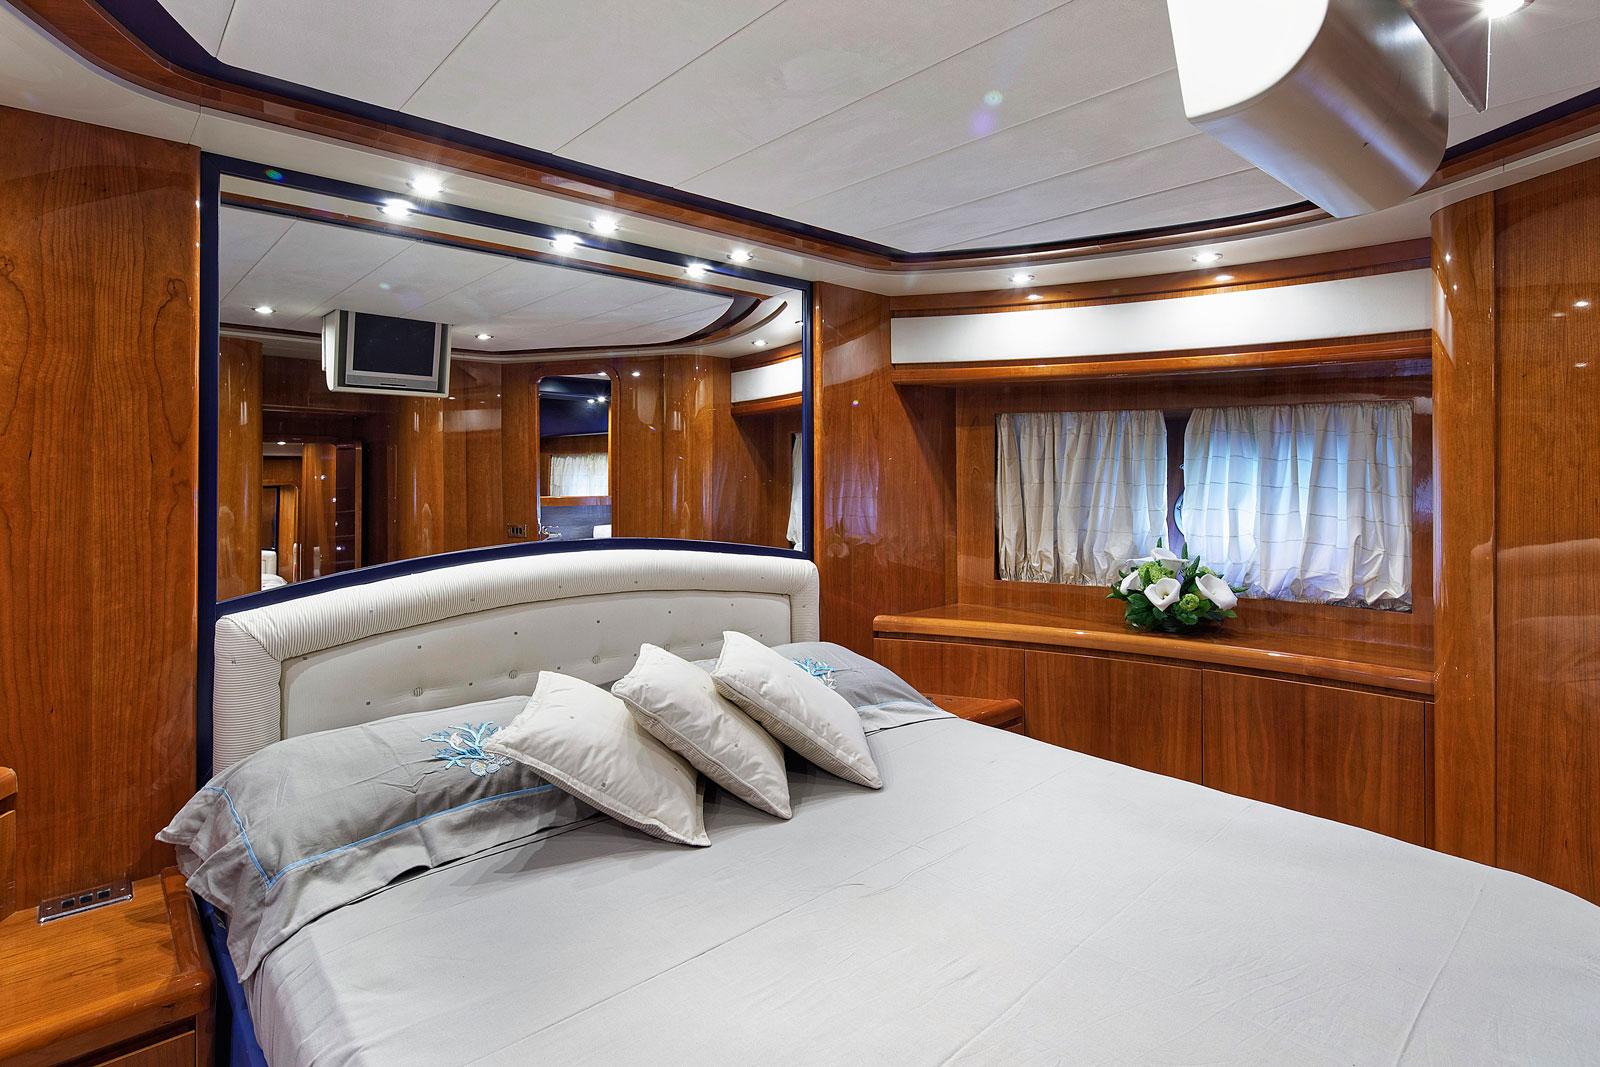 Motor Yacht AQVA - VIP cabin image 1